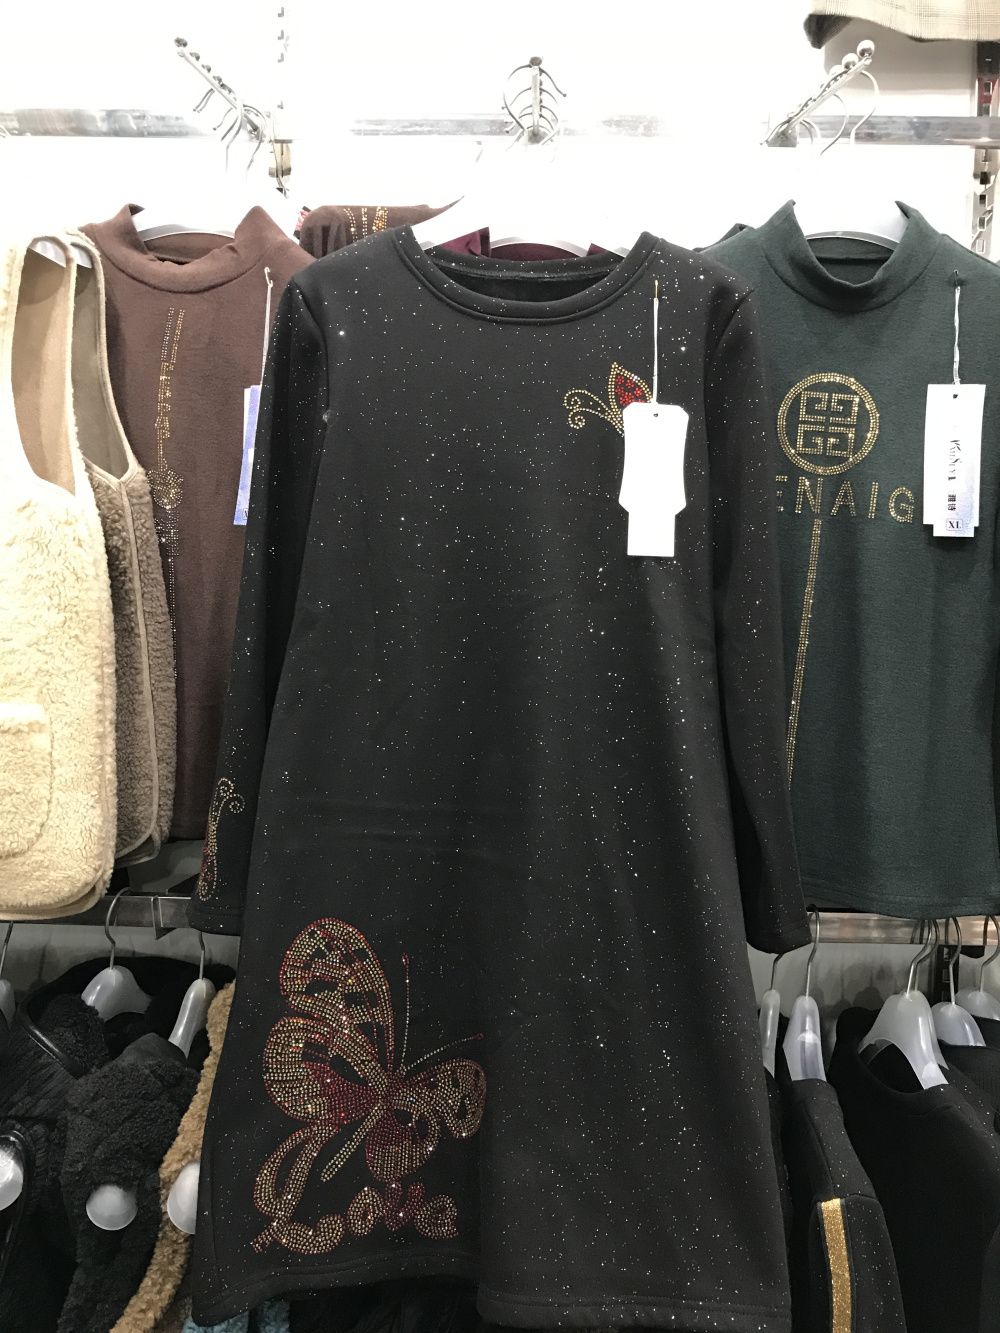 OWMMIZ Girls Boys Children Magic Sequin Sweatshirt Cotton Pullover Top Long Sleeve Kid/'s T-Shirts for Autumn and Winter